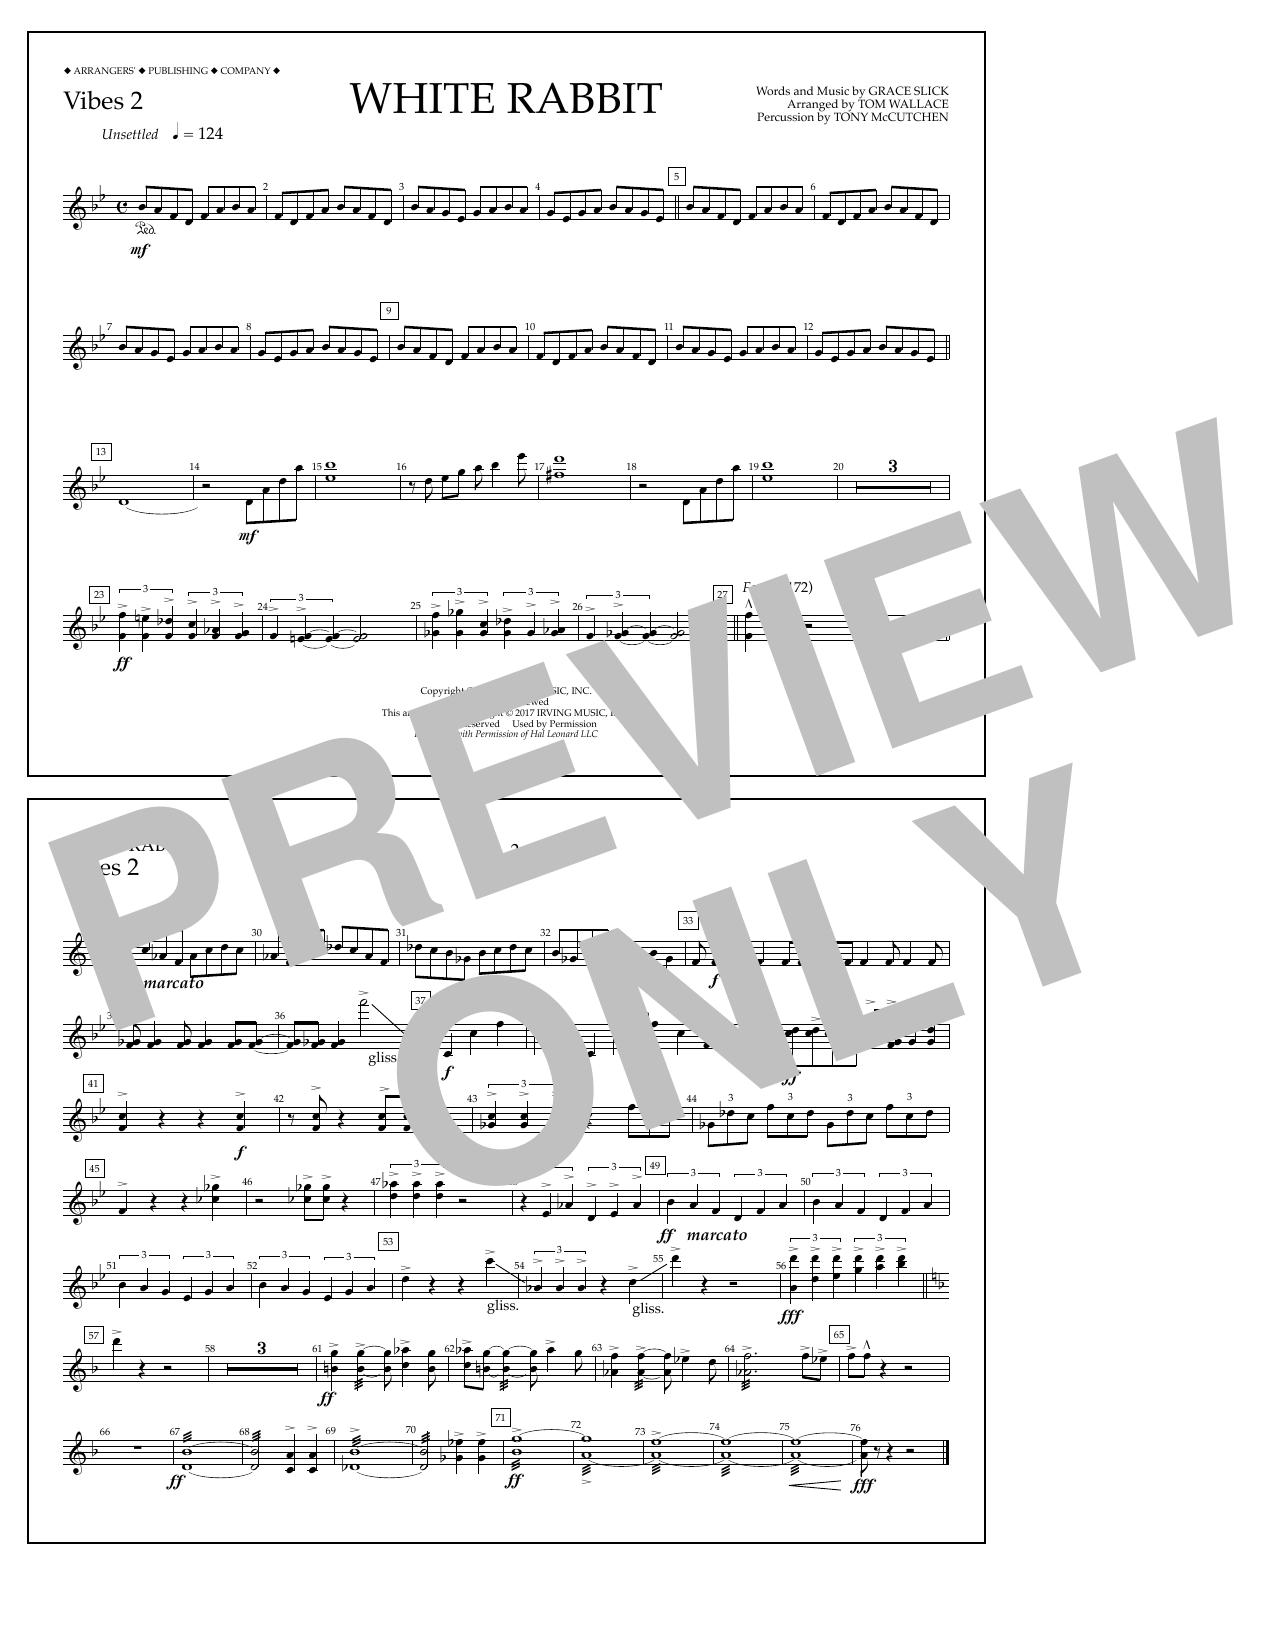 White Rabbit - Vibes 2 Sheet Music